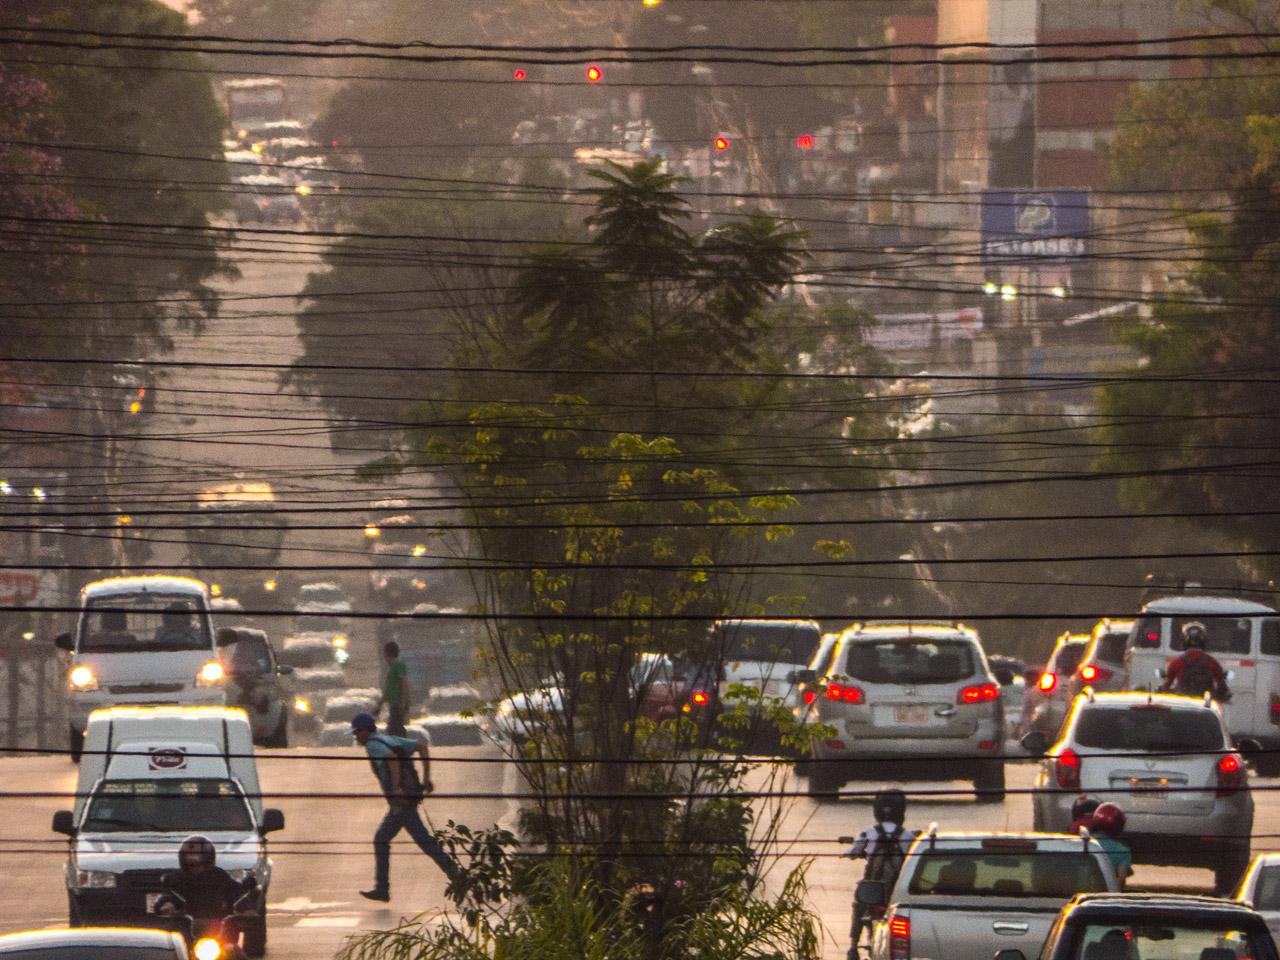 Tráfico de la avenida Eusebio Ayala, año 2015.